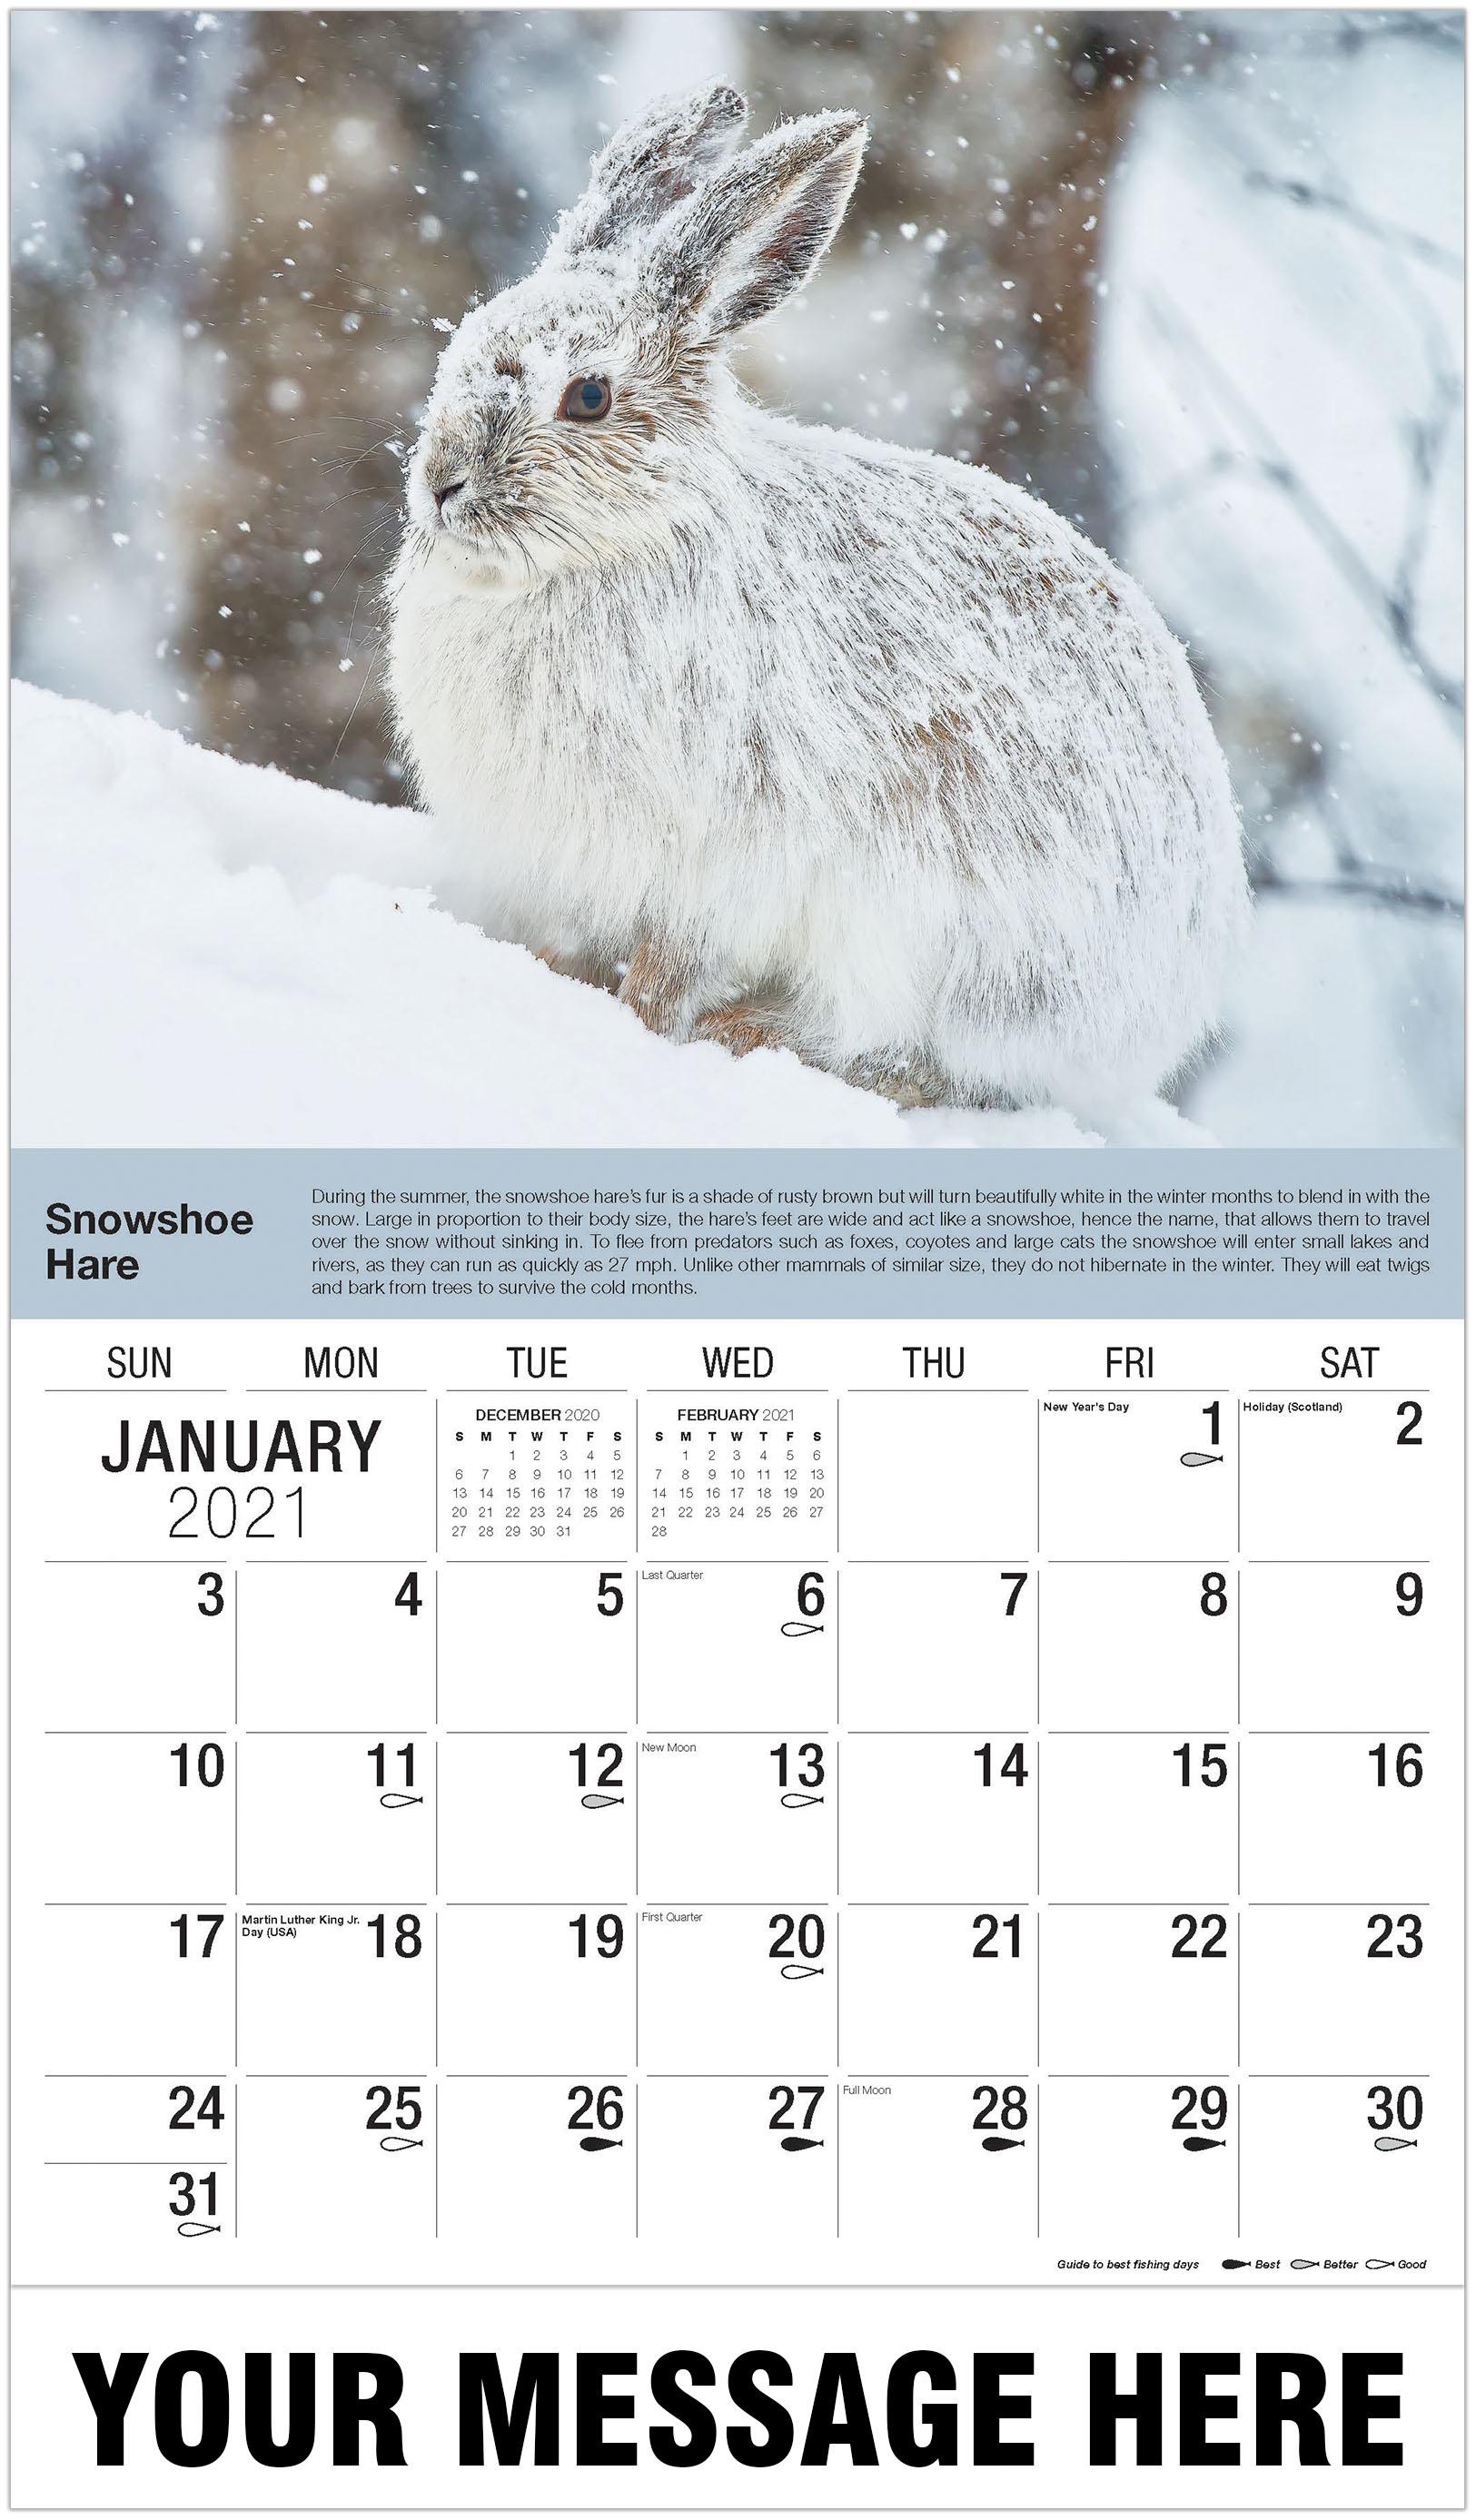 Snowshoe Hare - January - North American Wildlife 2021 Promotional Calendar